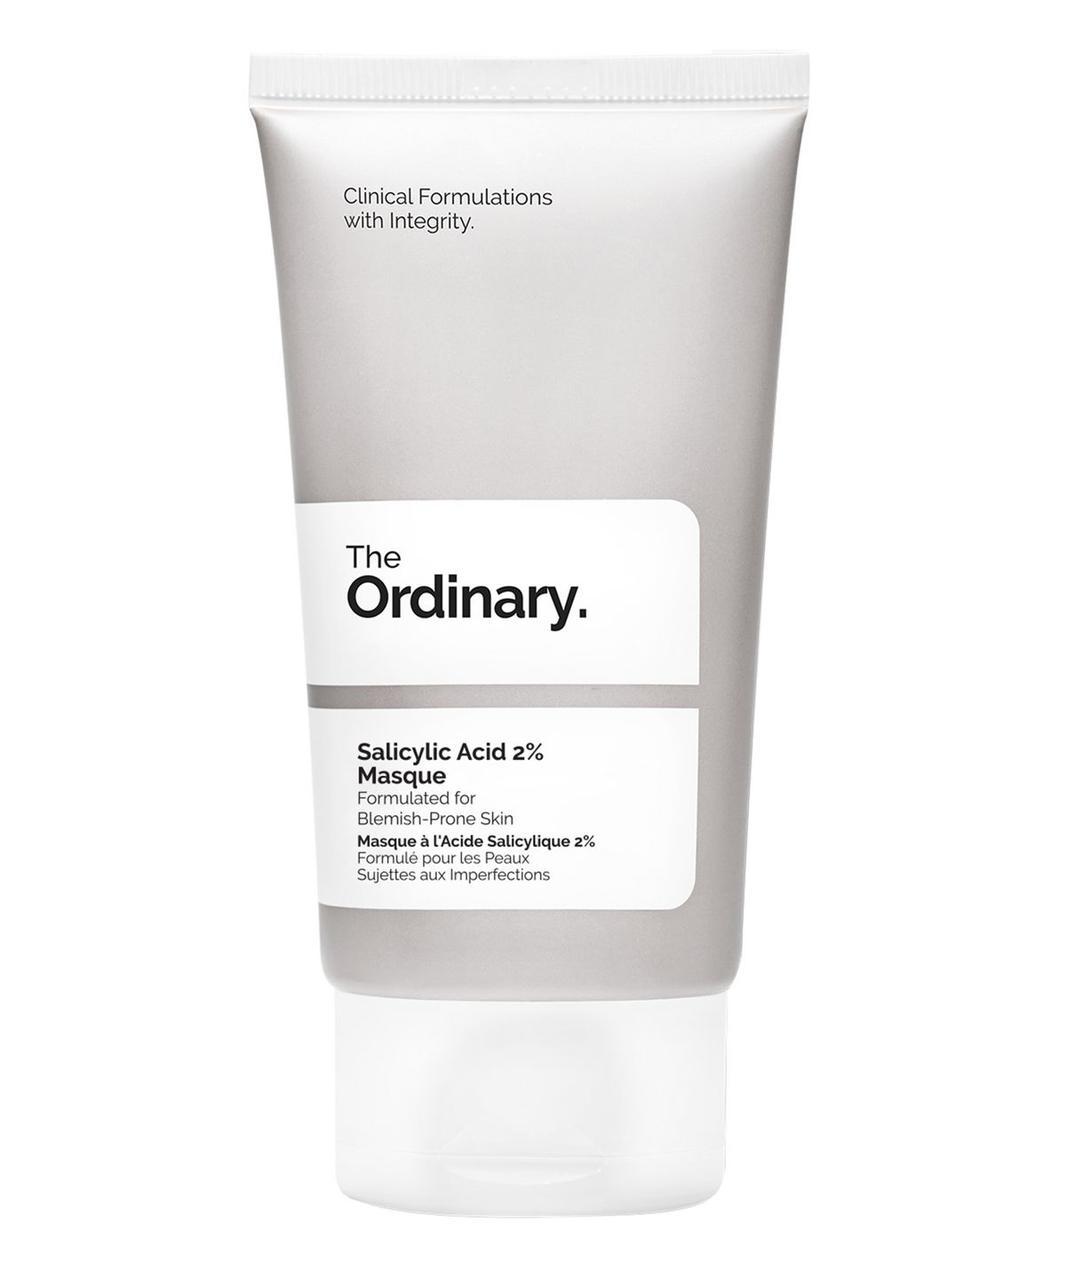 Маска с 2% салициловой кислотой The Ordinary - Salicylic Acid 2% Masque , 50 мл